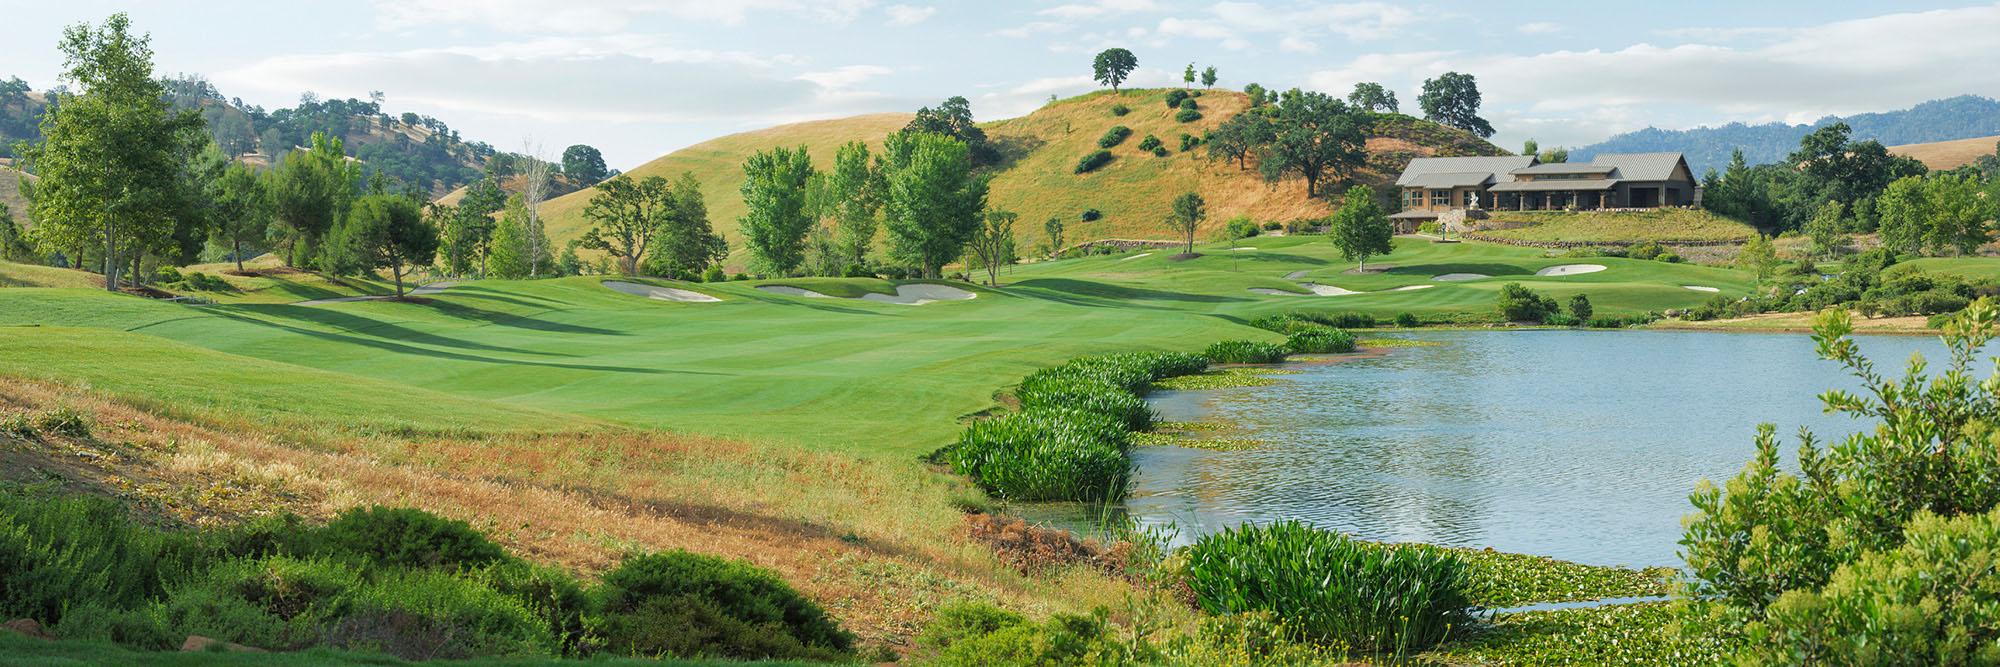 Golf Course Image - Yocha Dehe No. 18